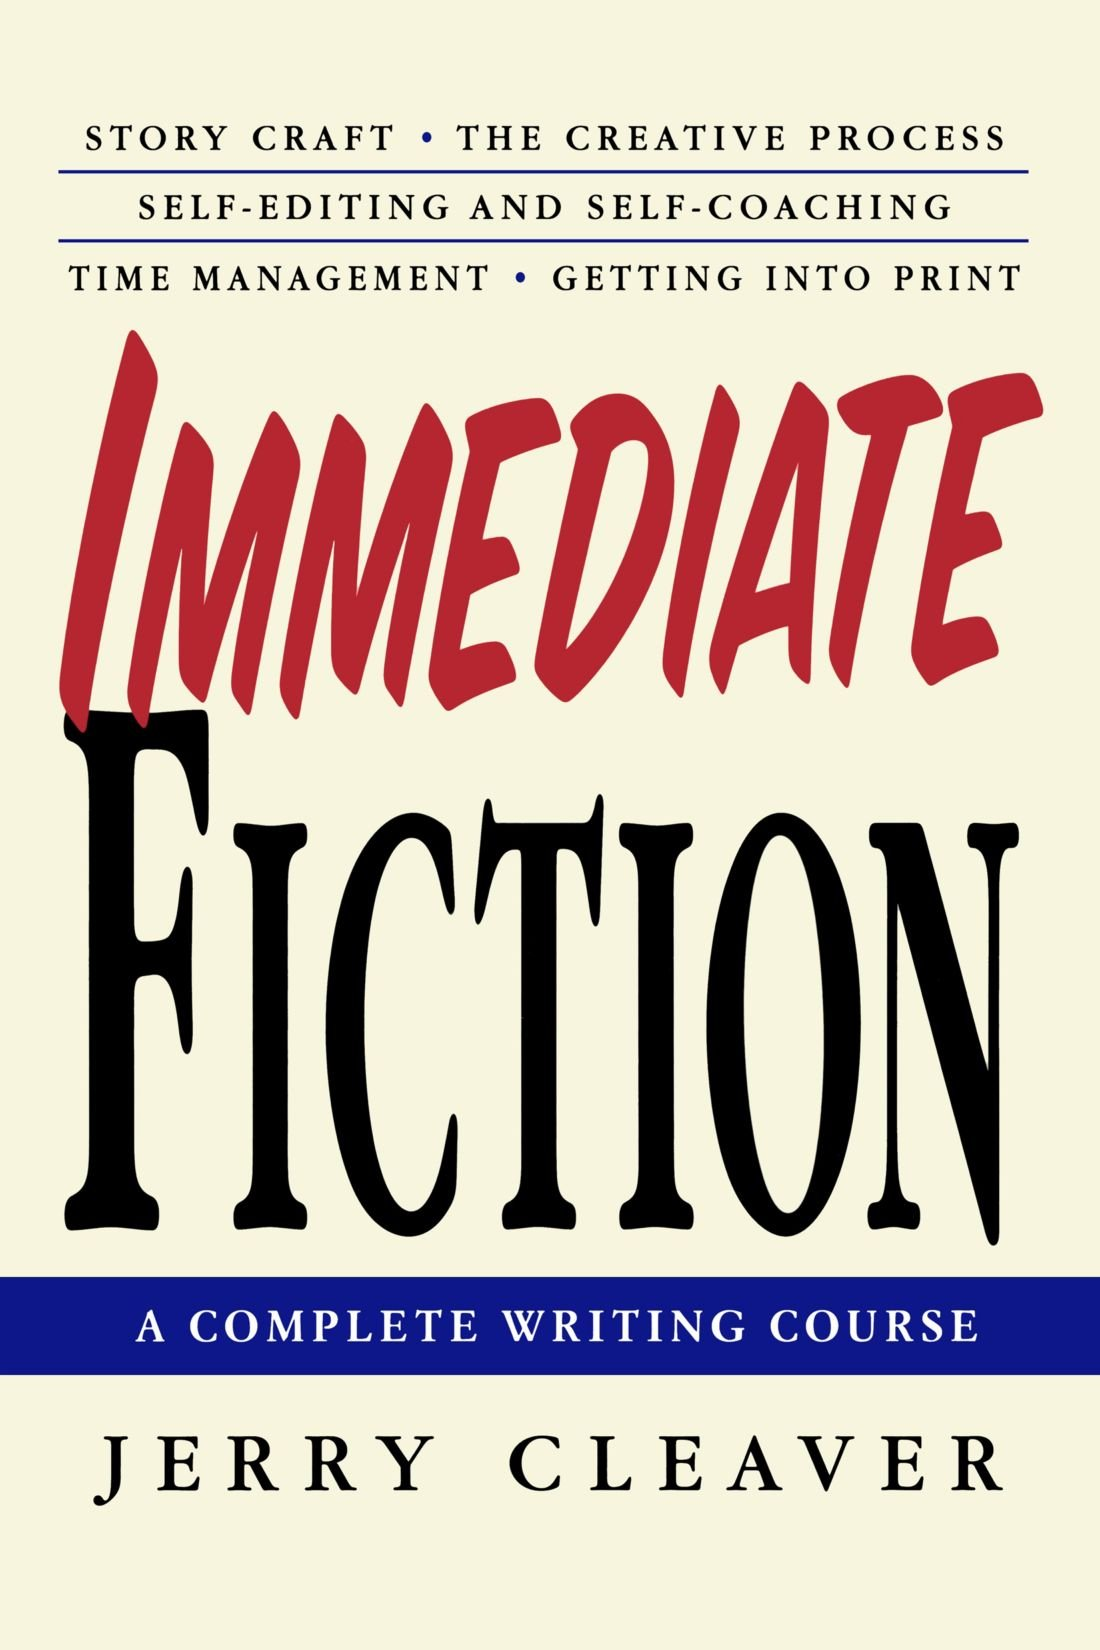 Immediate Fiction: A Complete Writing Course (Anglais) Broché – 14 décembre 2004 Jerry Cleaver St Martin' s Press 0312302762 Briefe